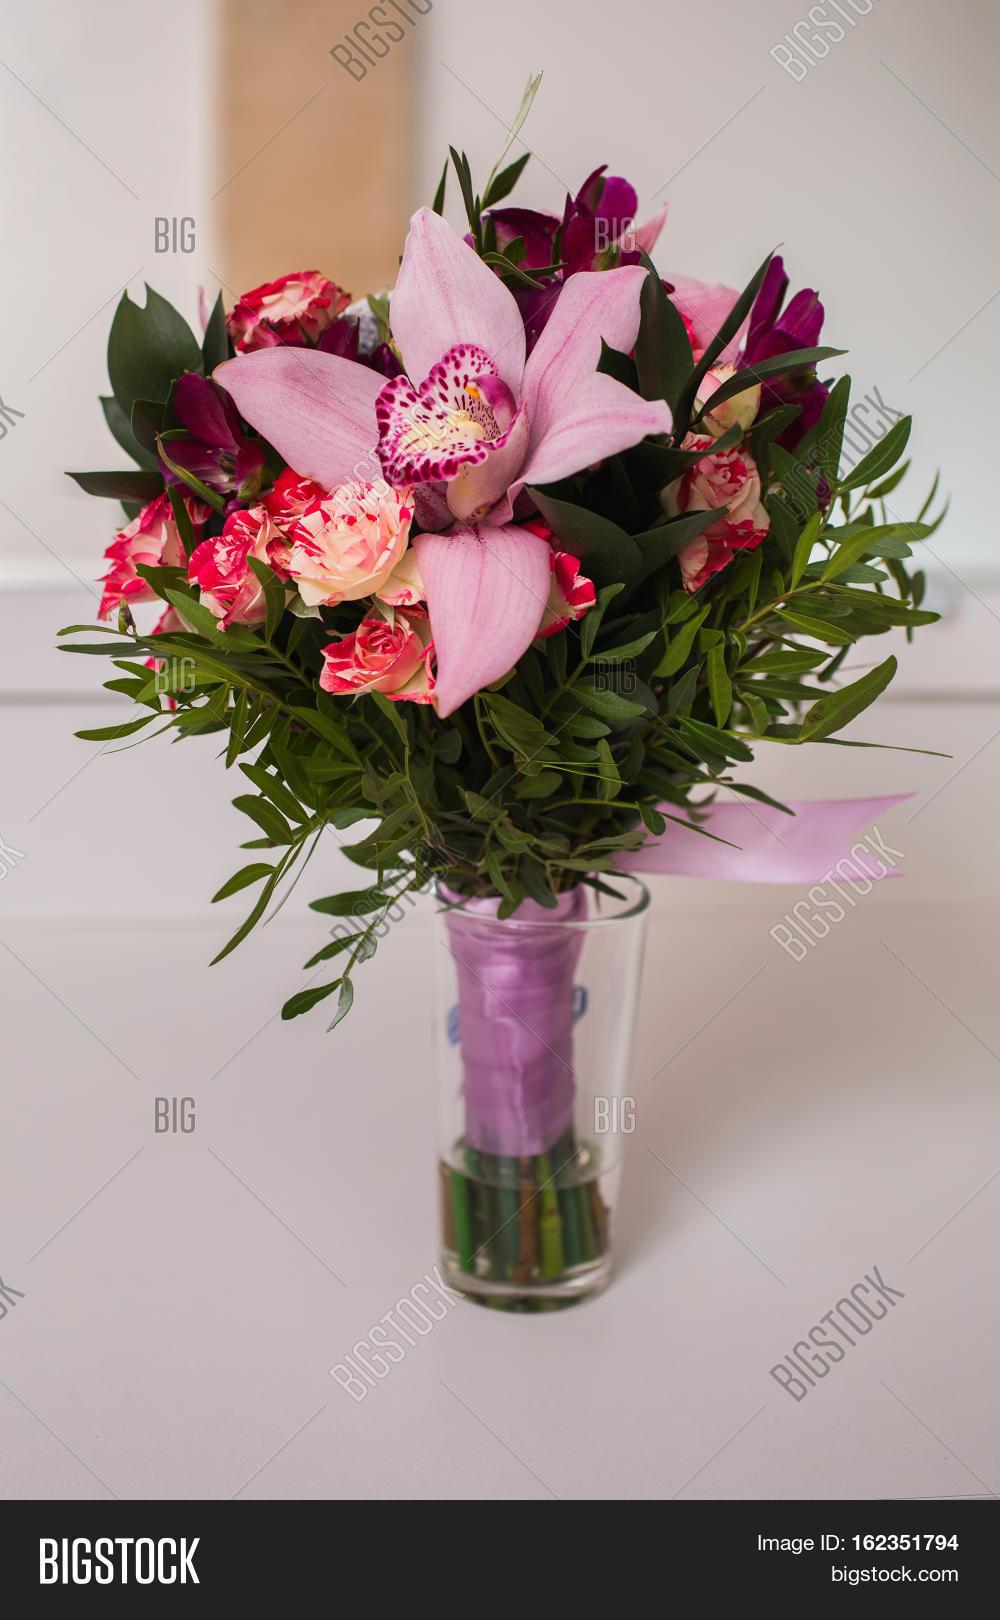 Wedding Flowers Image Photo Free Trial Bigstock